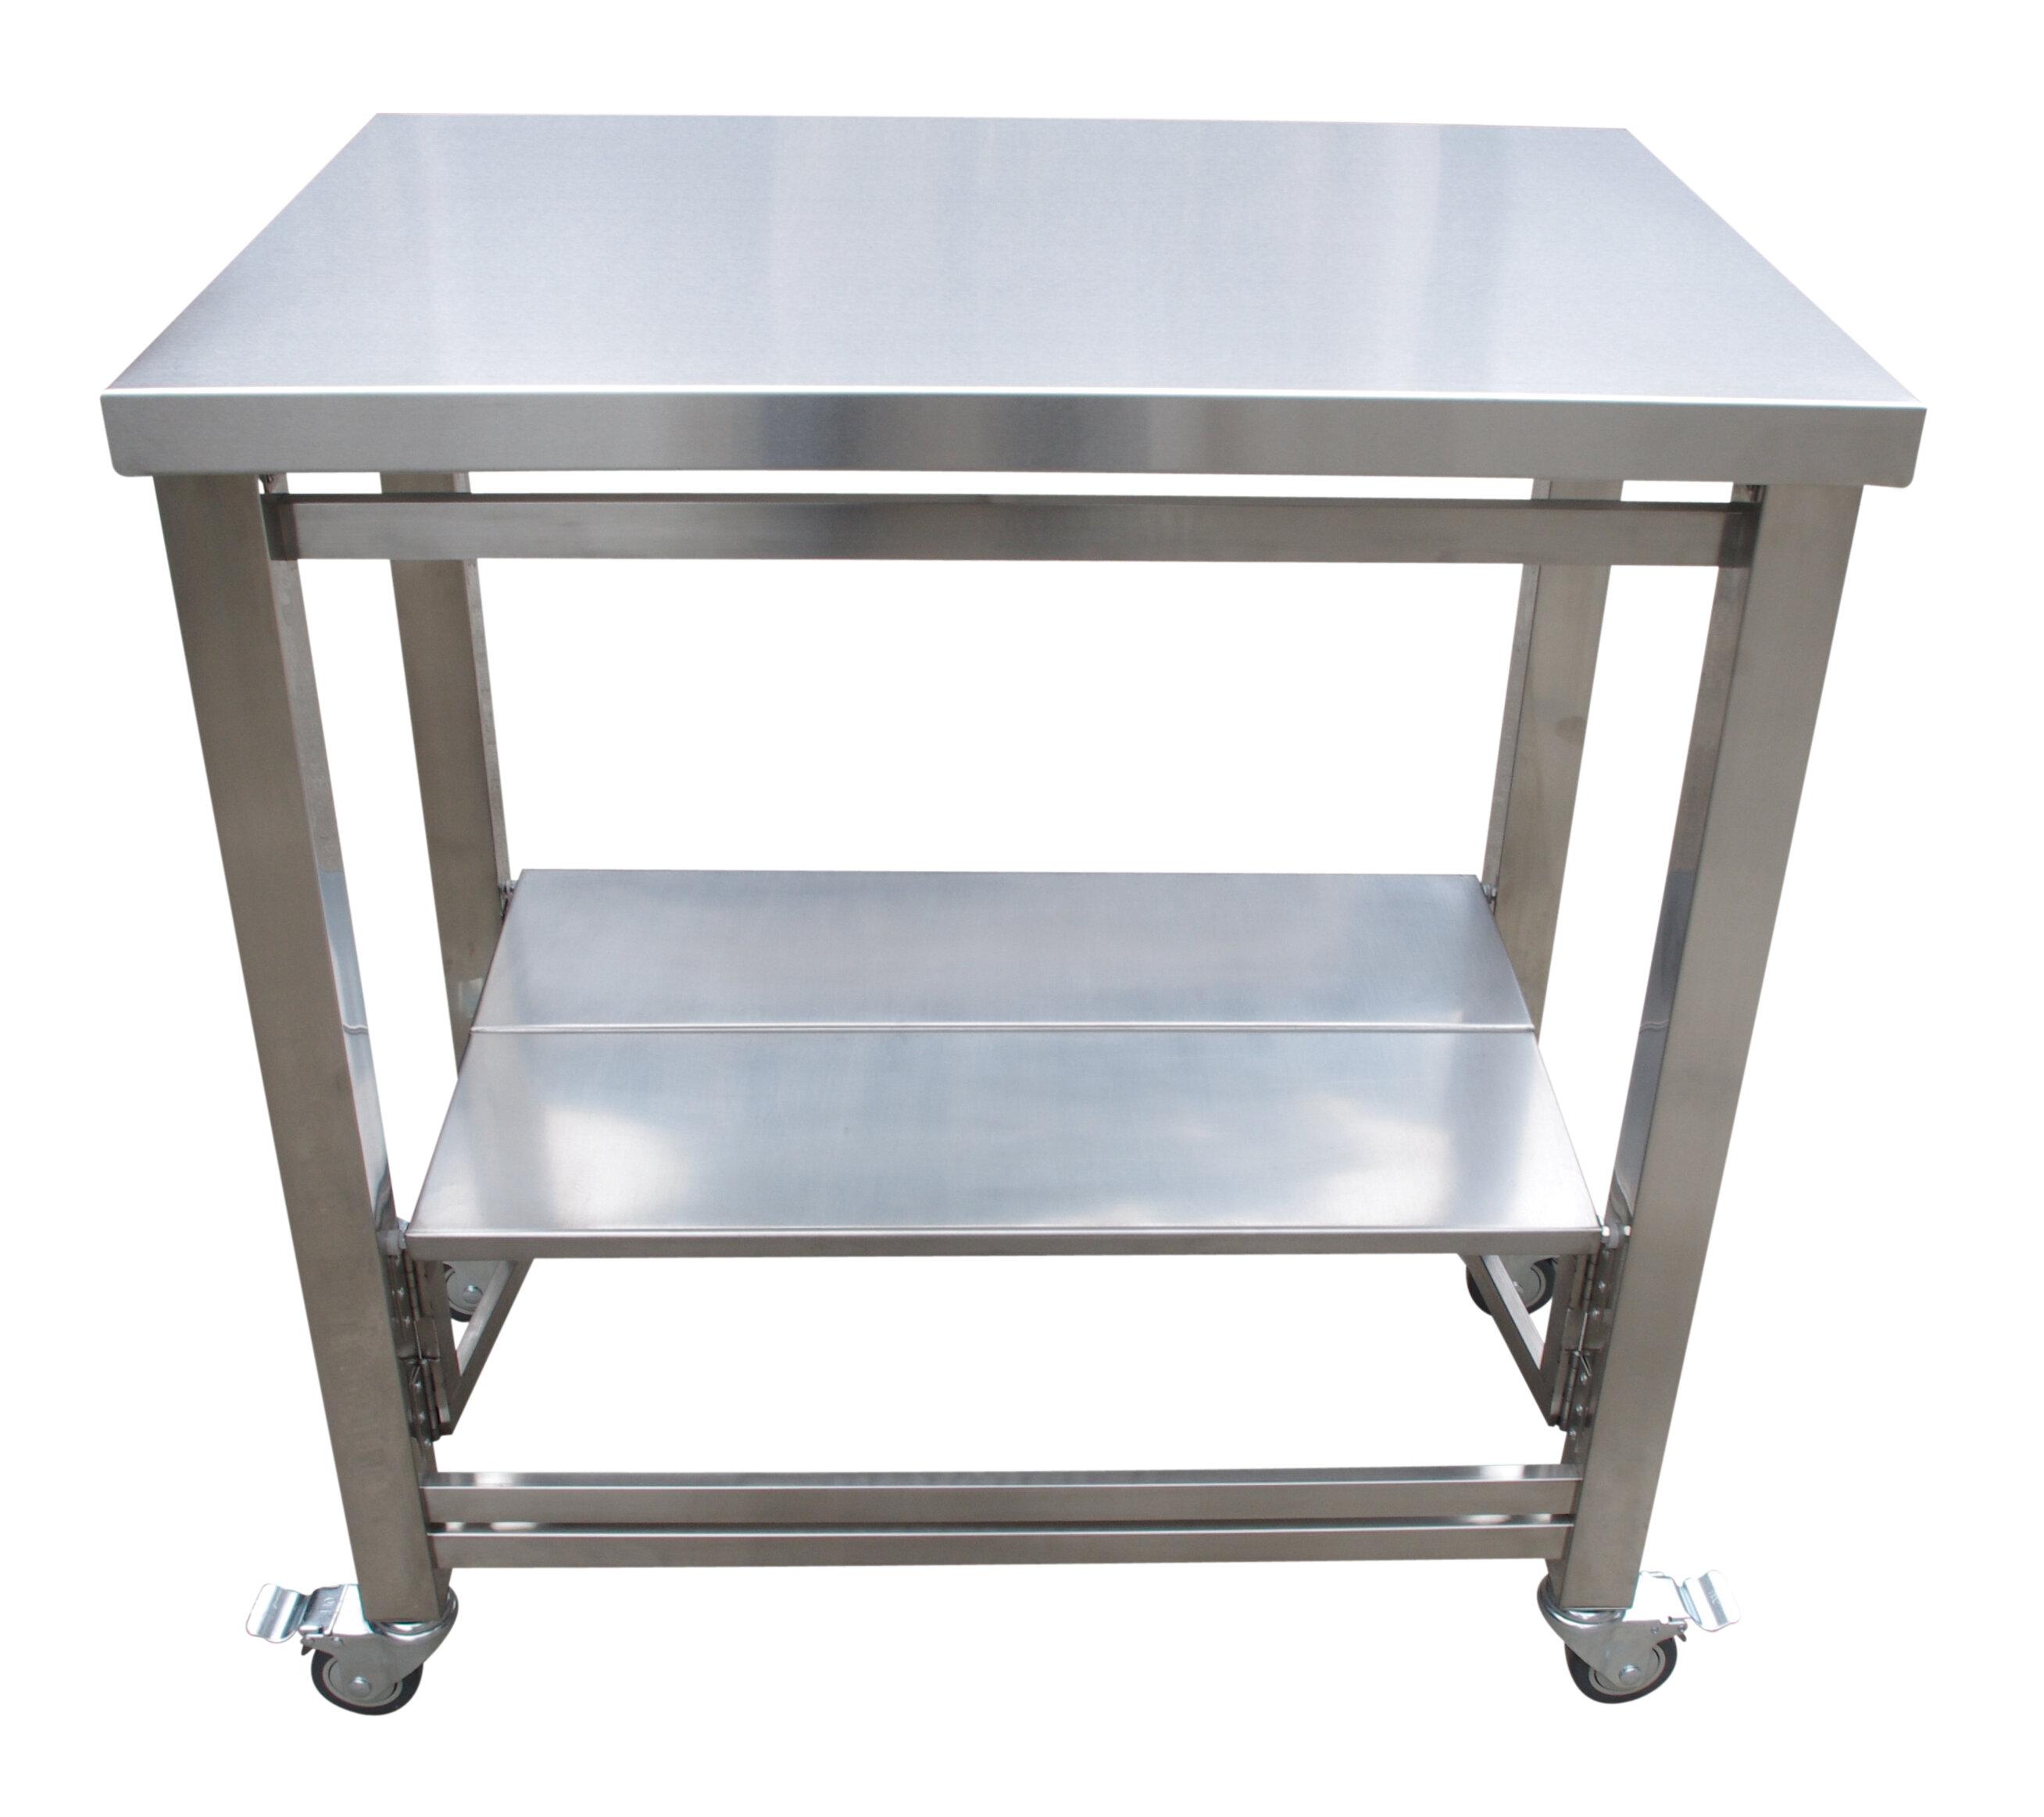 Symple Stuff The Flip and Fold Work Station Kitchen Cart | Wayfair